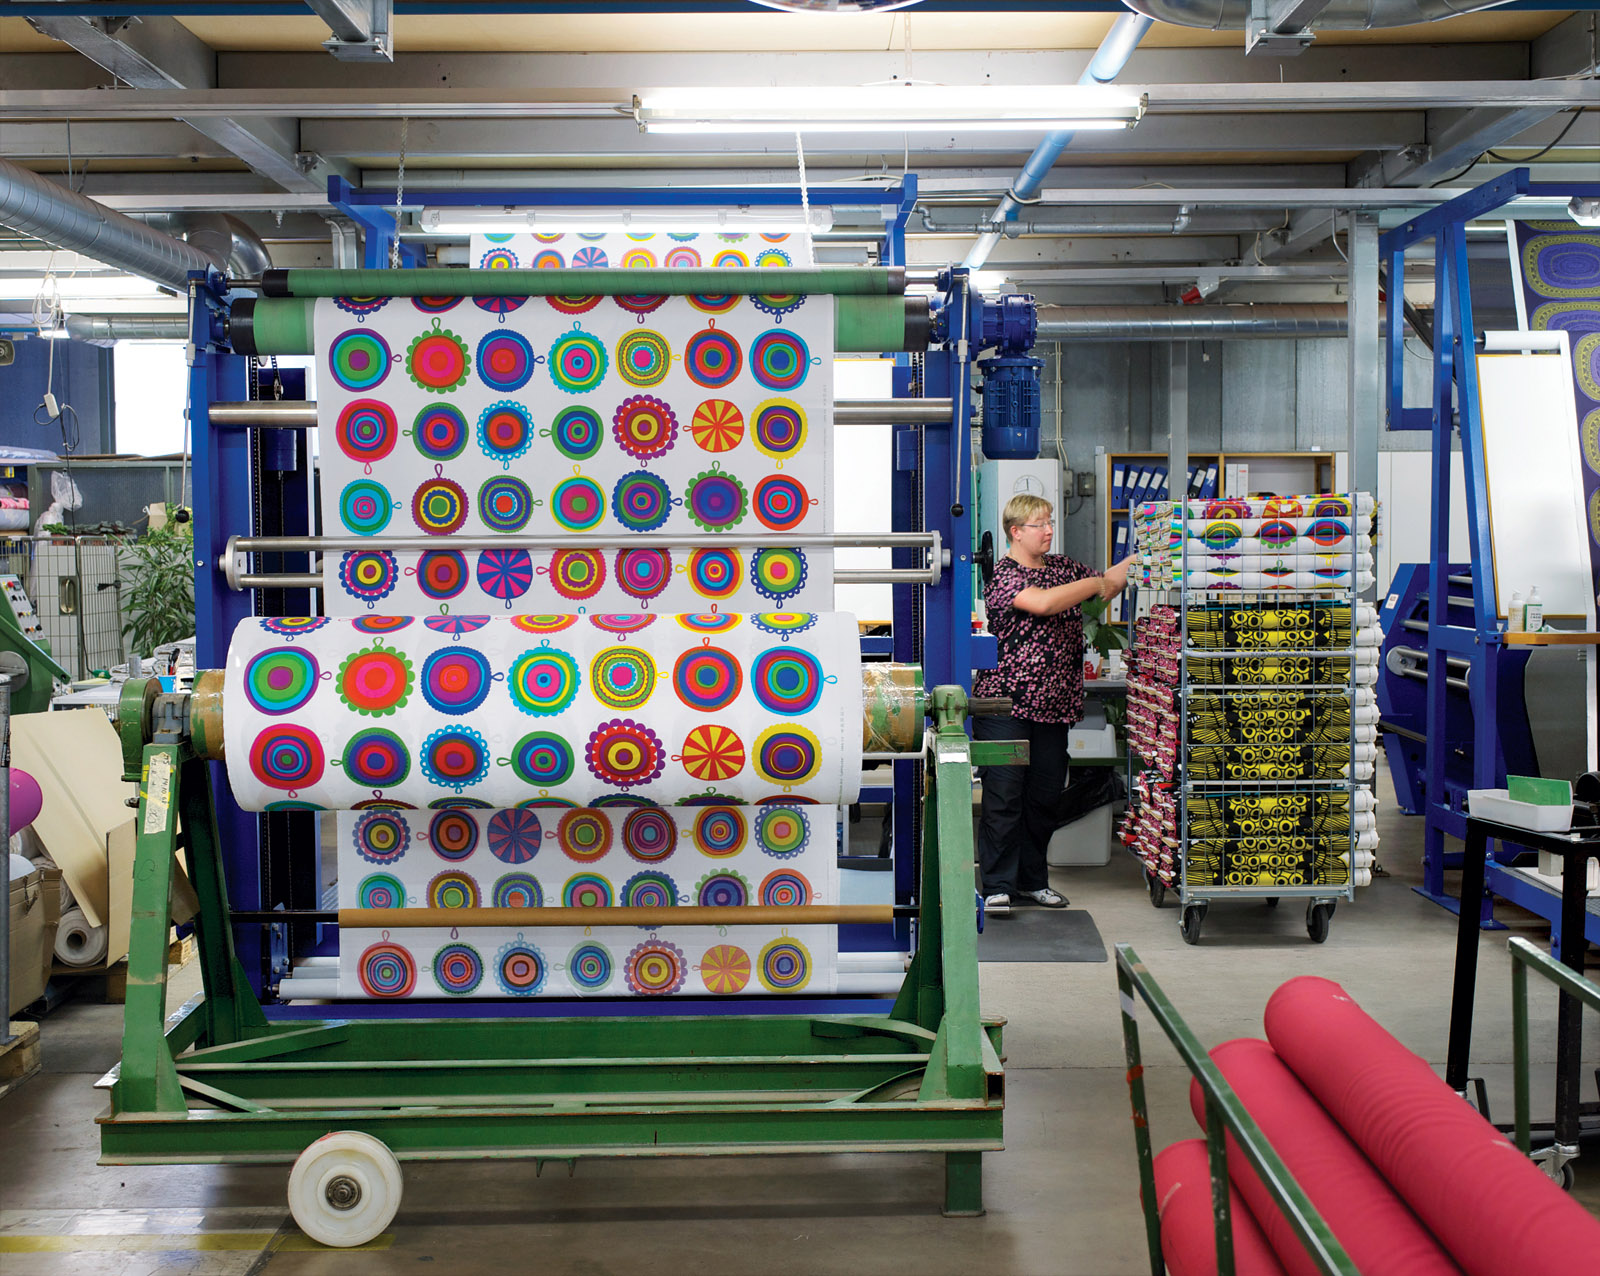 Marimekko factory interior in Helsinki, Finland